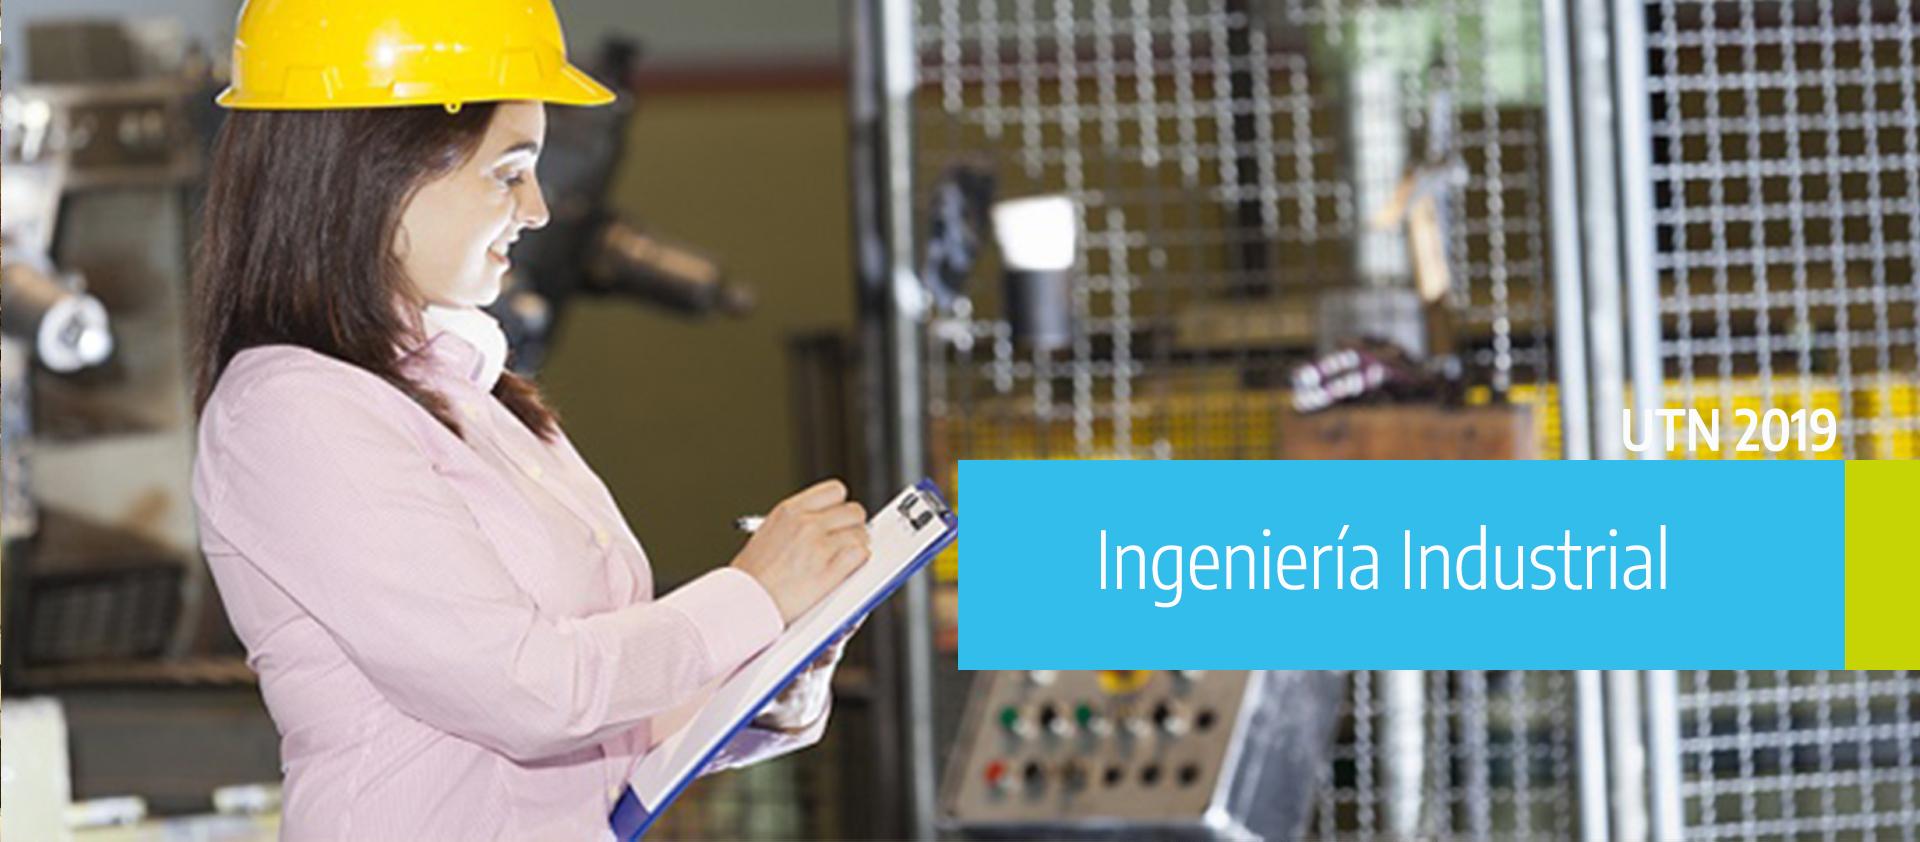 Inge Industrial